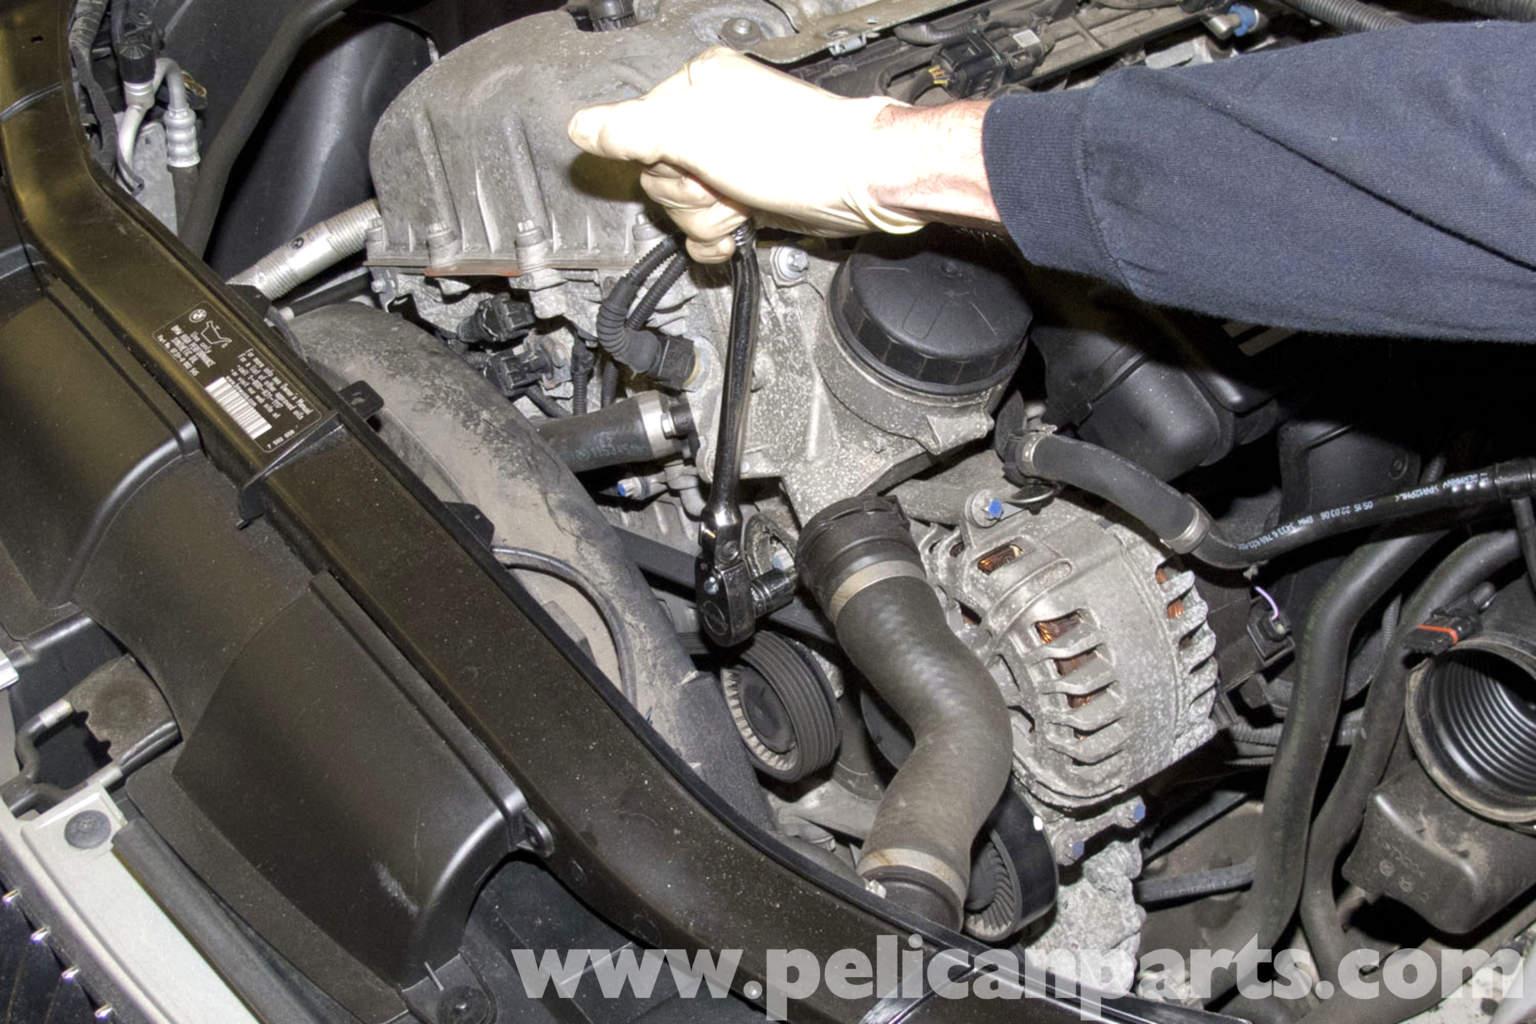 Li Engine Diagram Bmw E90 Drive Belt Replacement E91 E92 E93 Pelican